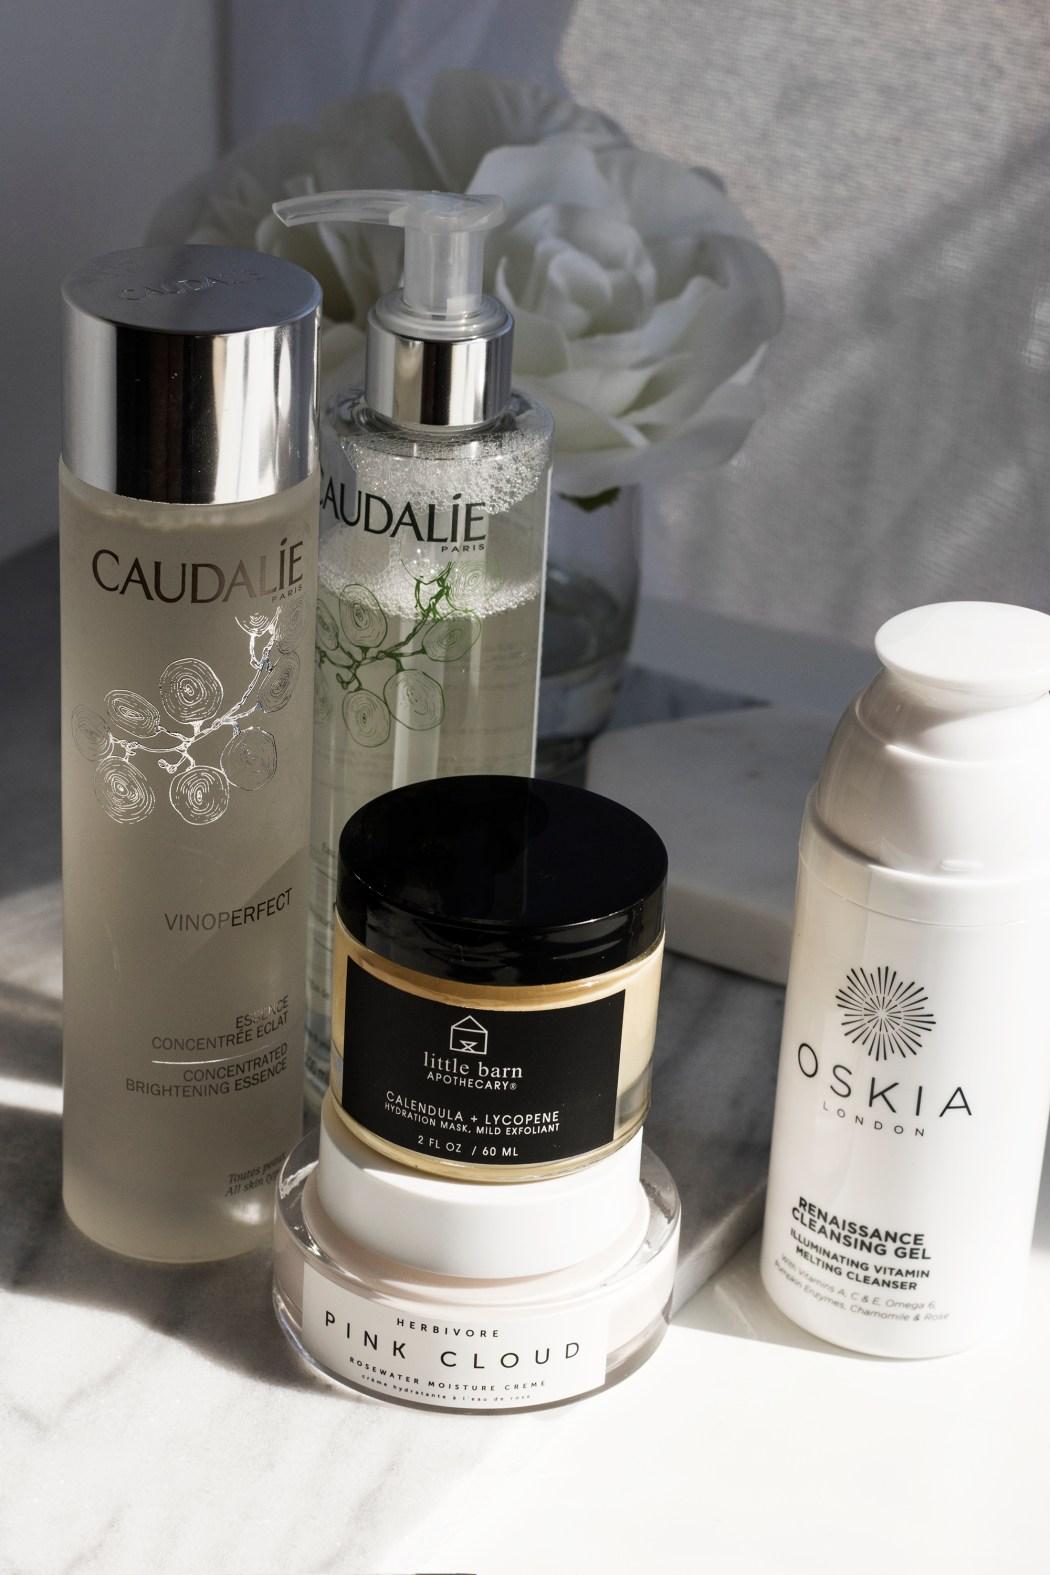 Caudalie essence, caudalie micellar water, Herbivore pink cloud, Little Barn Apothecary face mask, Oskia Renaissance Cleansing Gel